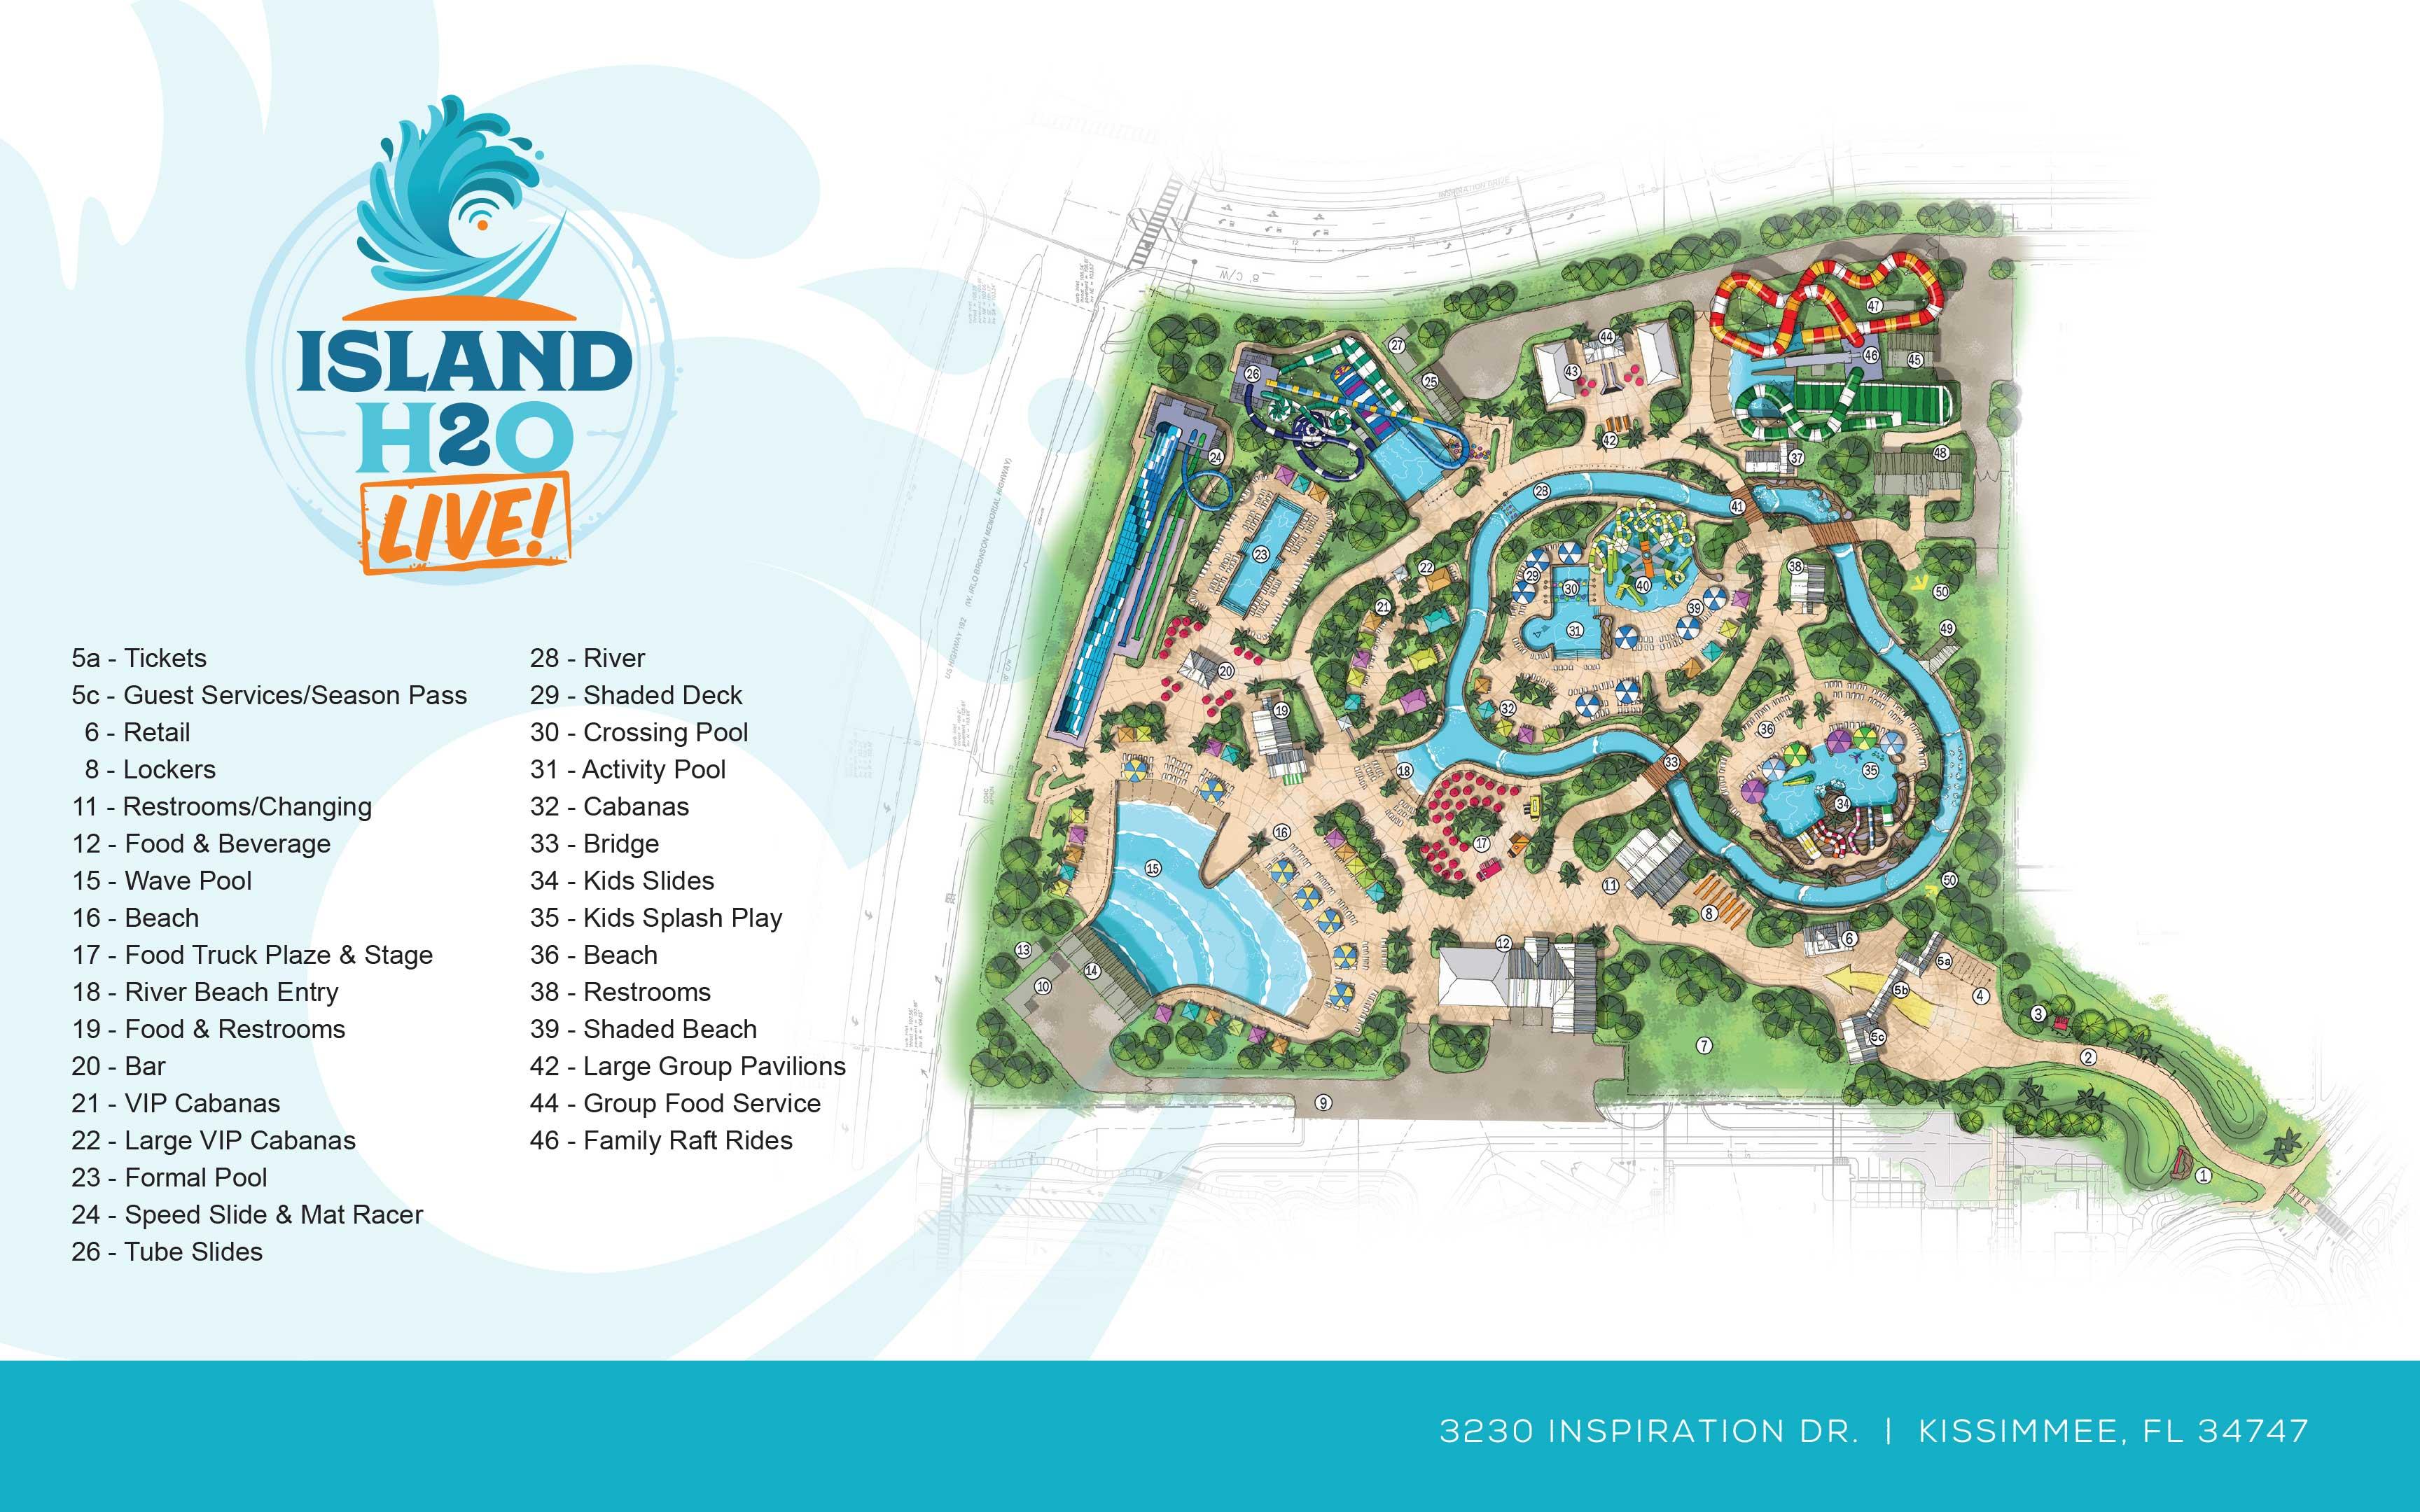 Island H2O Live - Photo 1 of 9